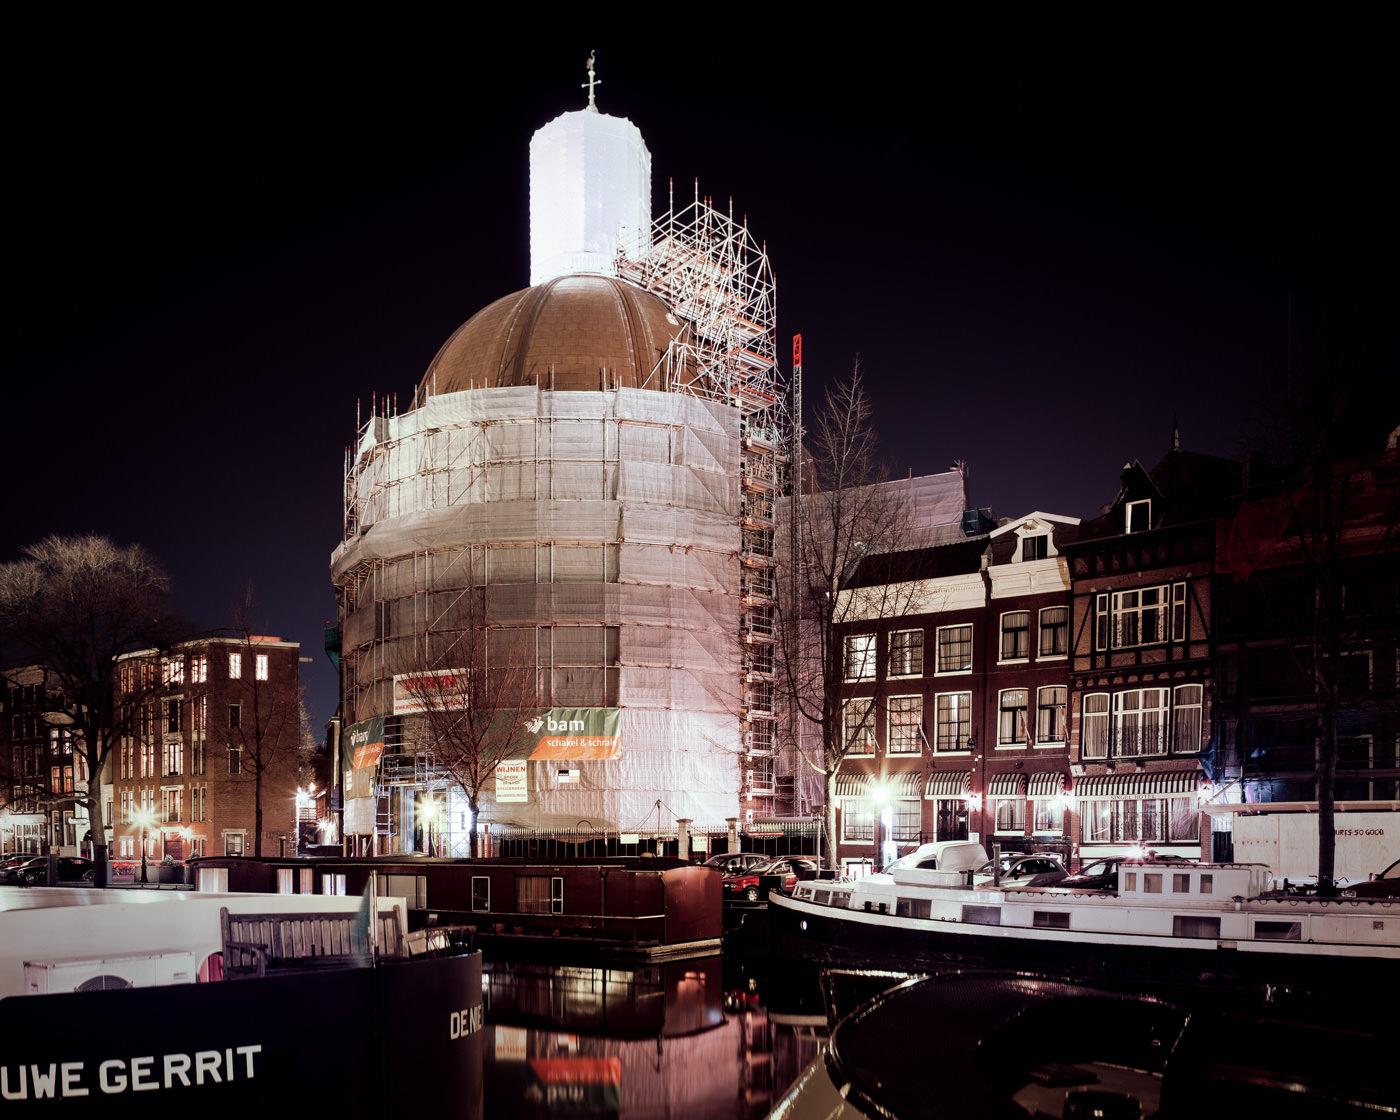 """Ronde Lutherse Kerk, Amsterdam"" from the series Nylon Chrysalis, by William Mokrynski"